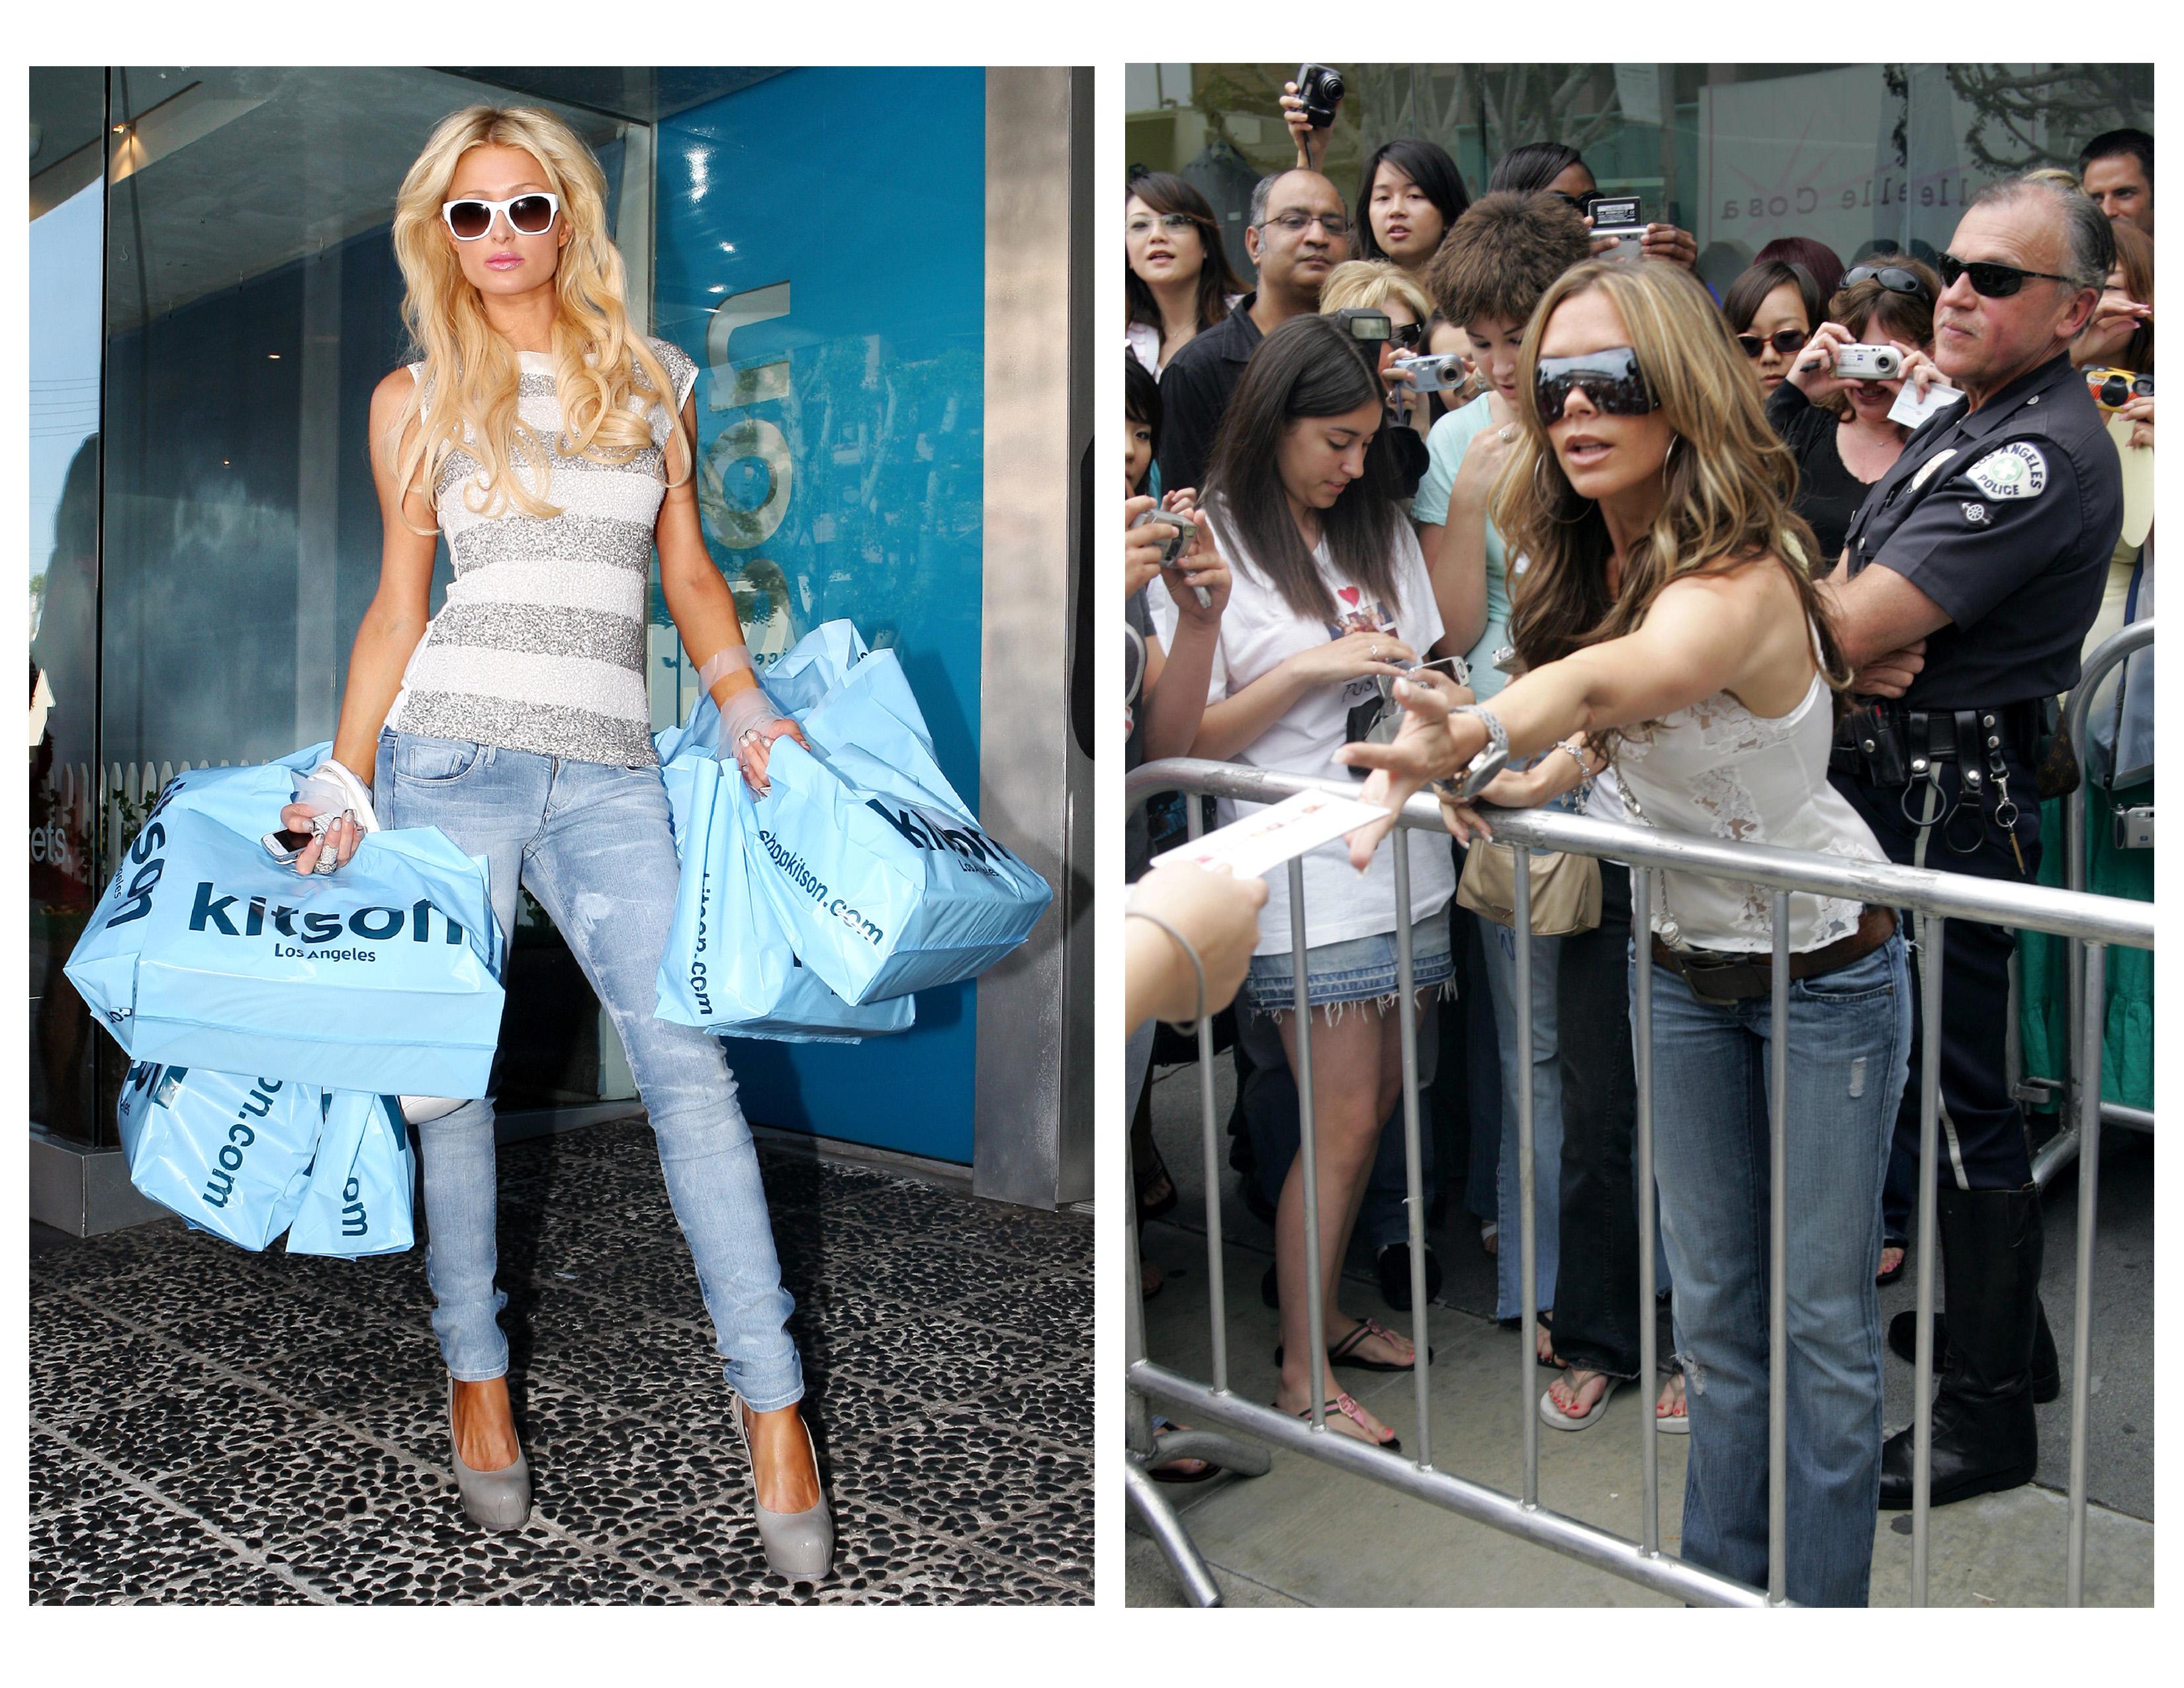 Paris Hilton Victoria Beckham Kitson